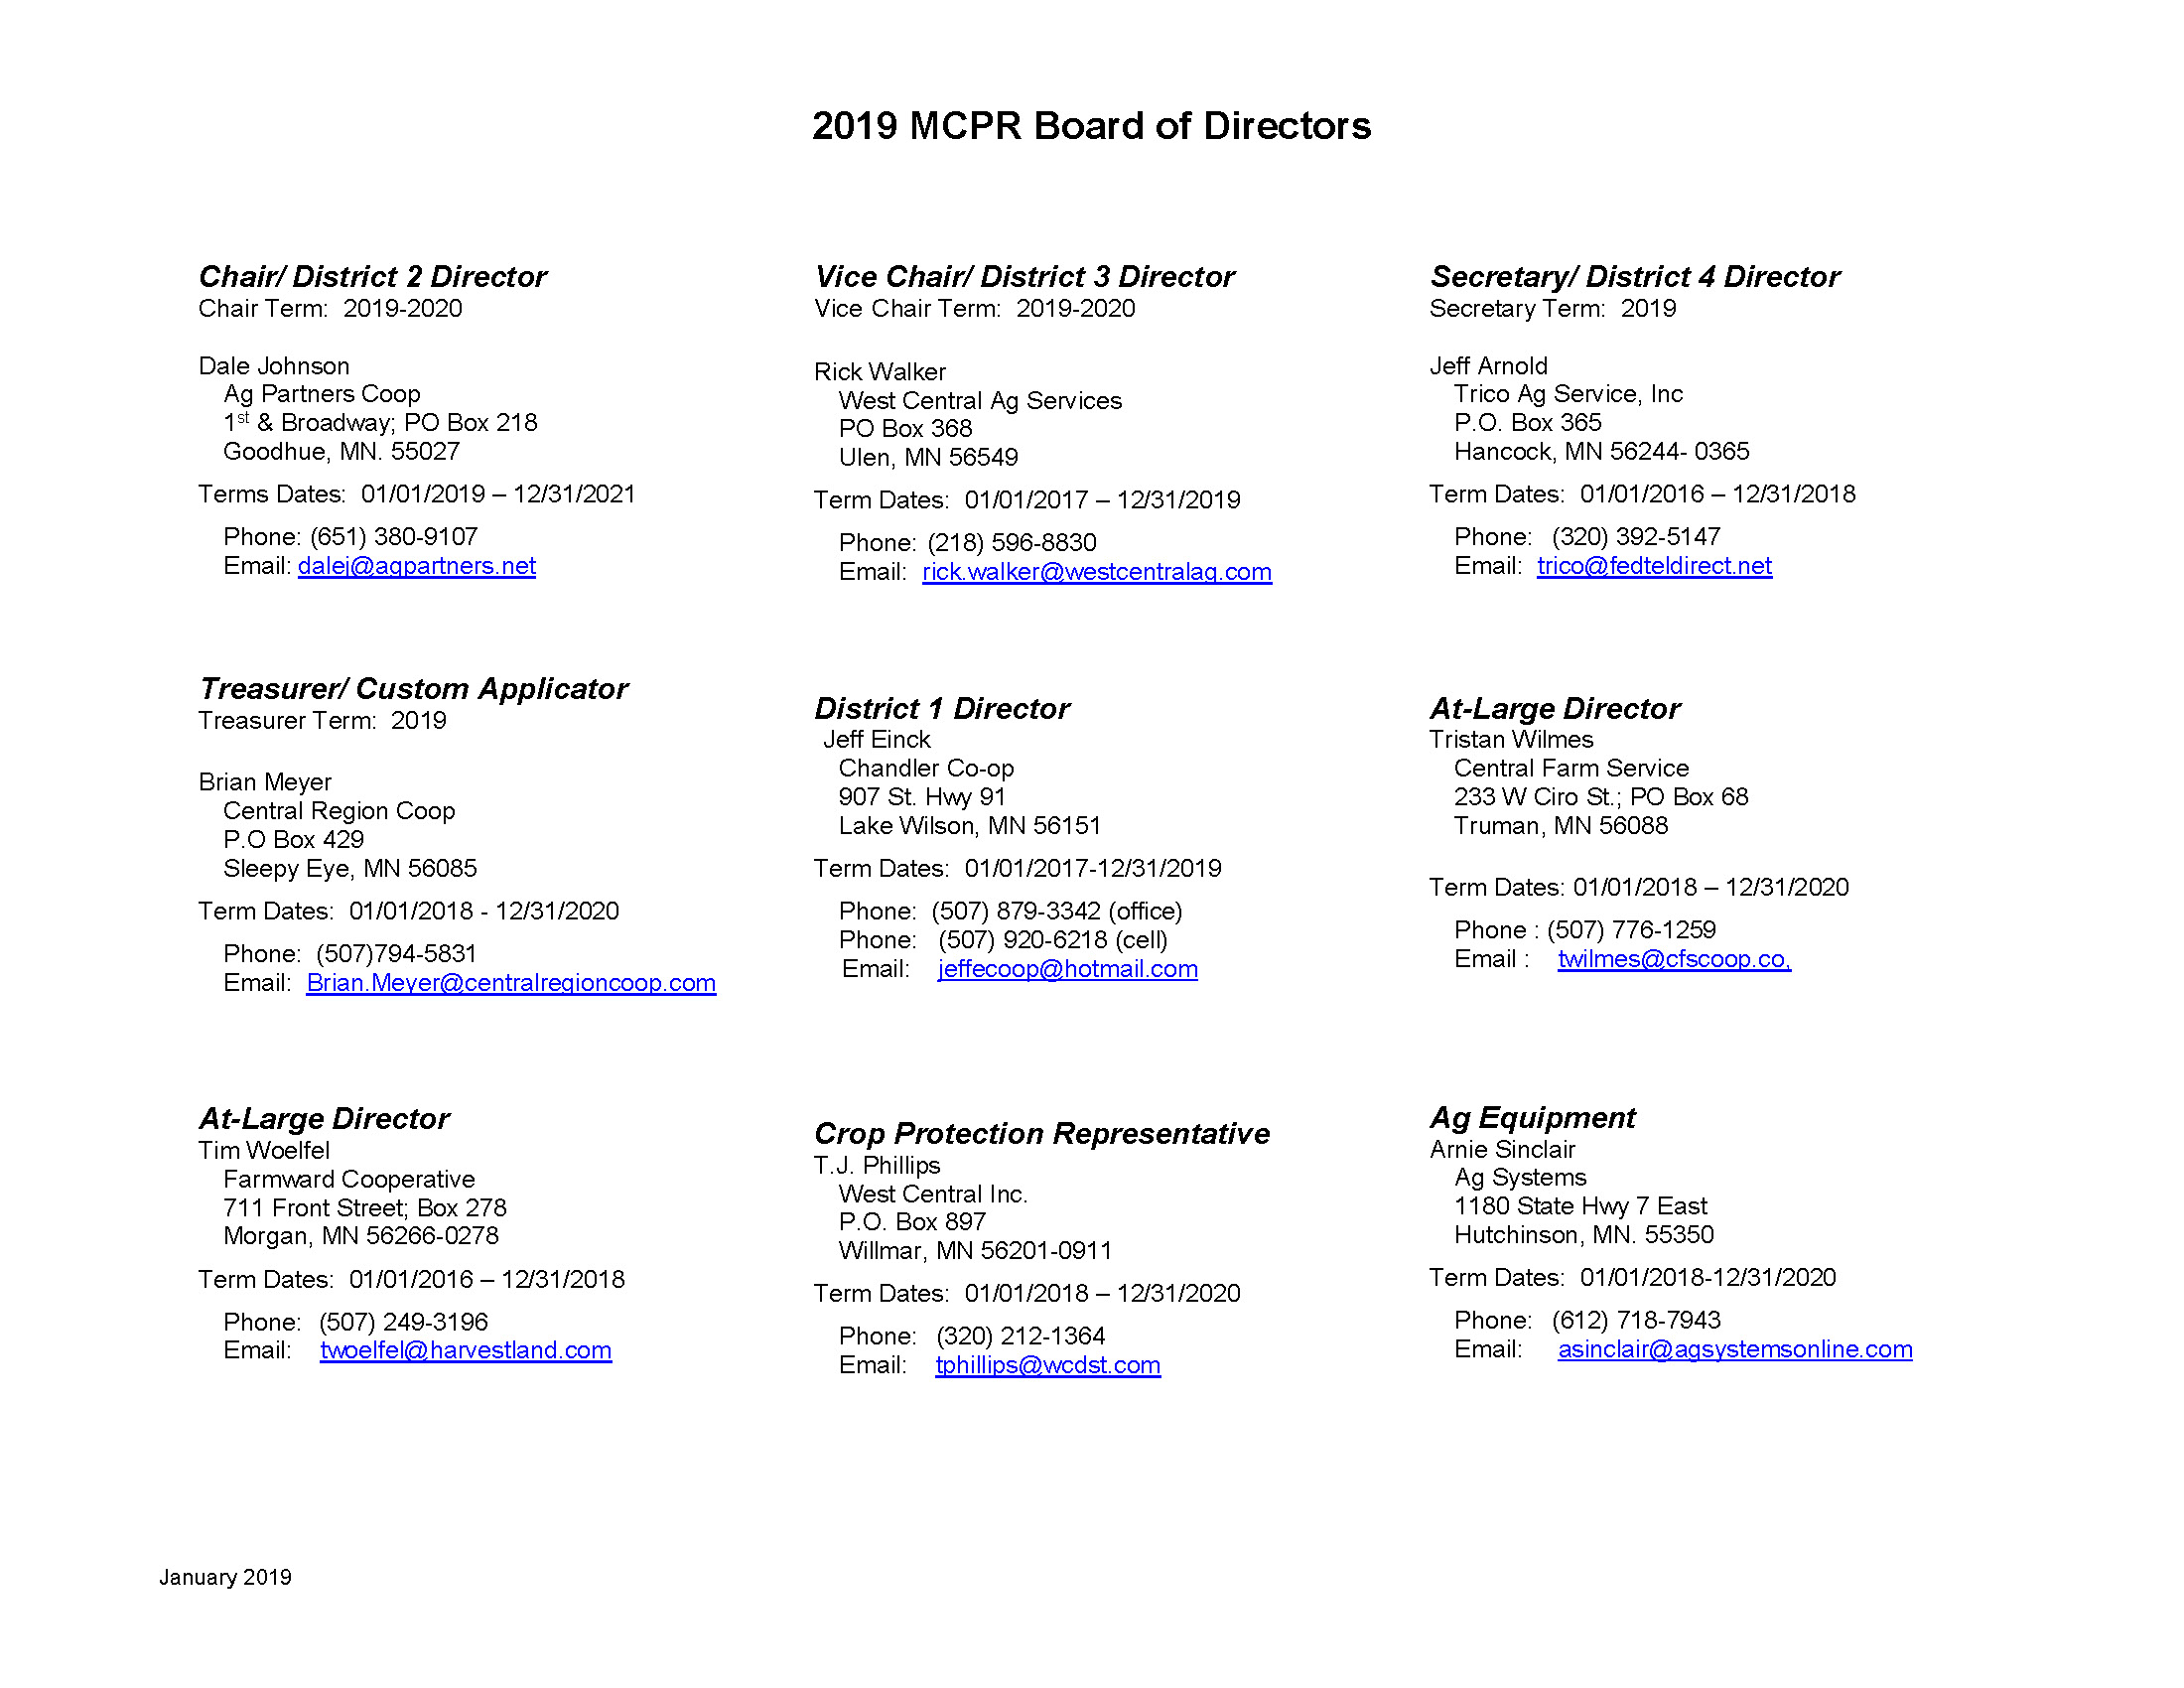 2019 MCPR Board of Directors_Page_1